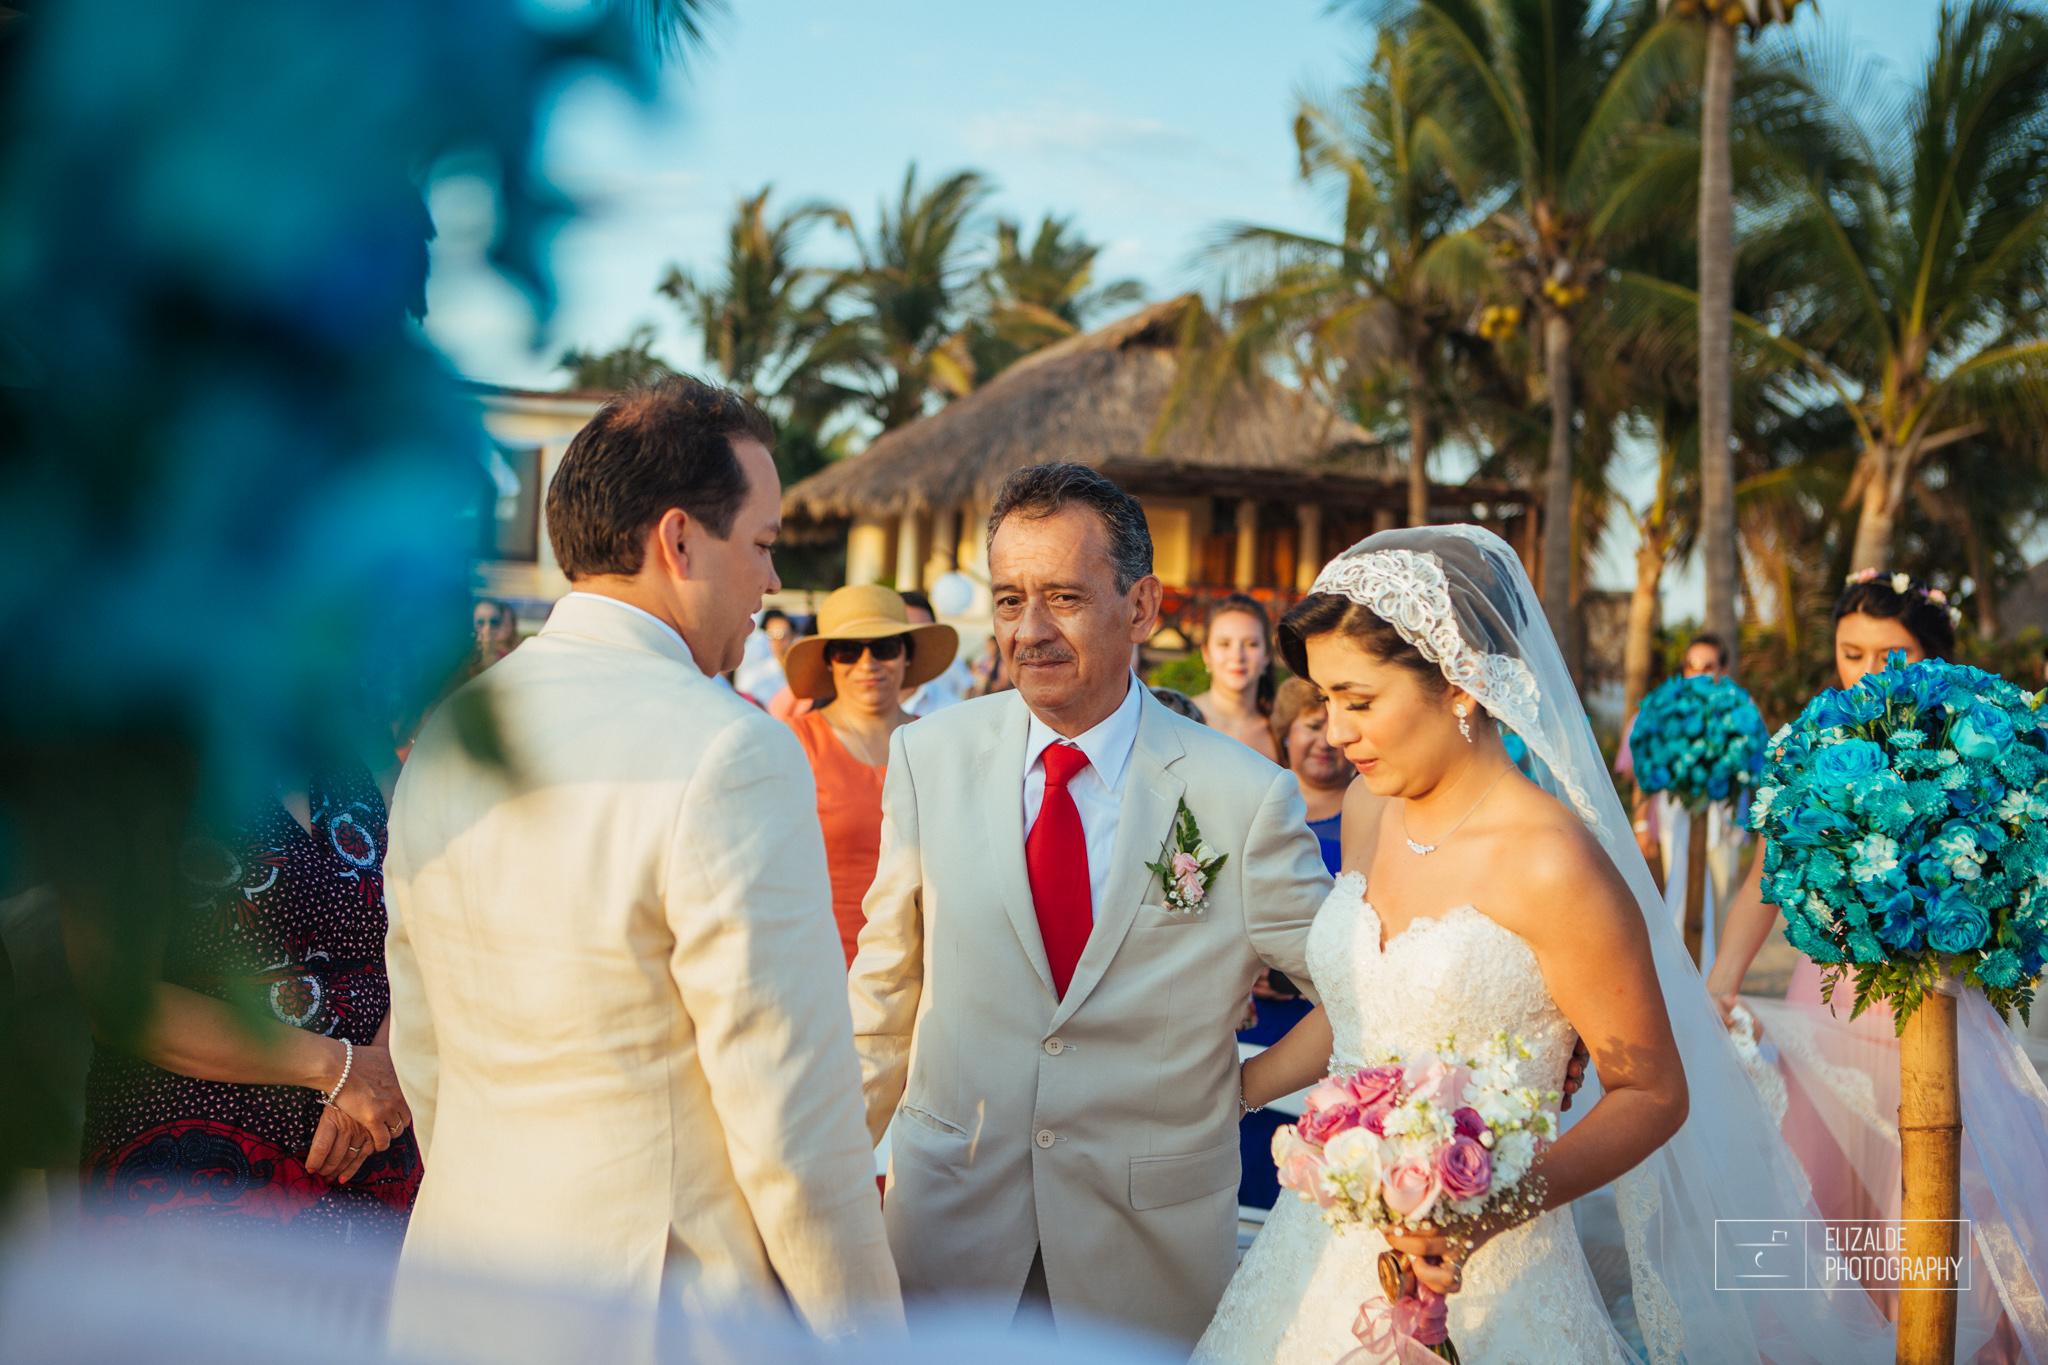 Pay and Ferran_Acapulco_Destination Wedding_Elizalde Photography-82.jpg